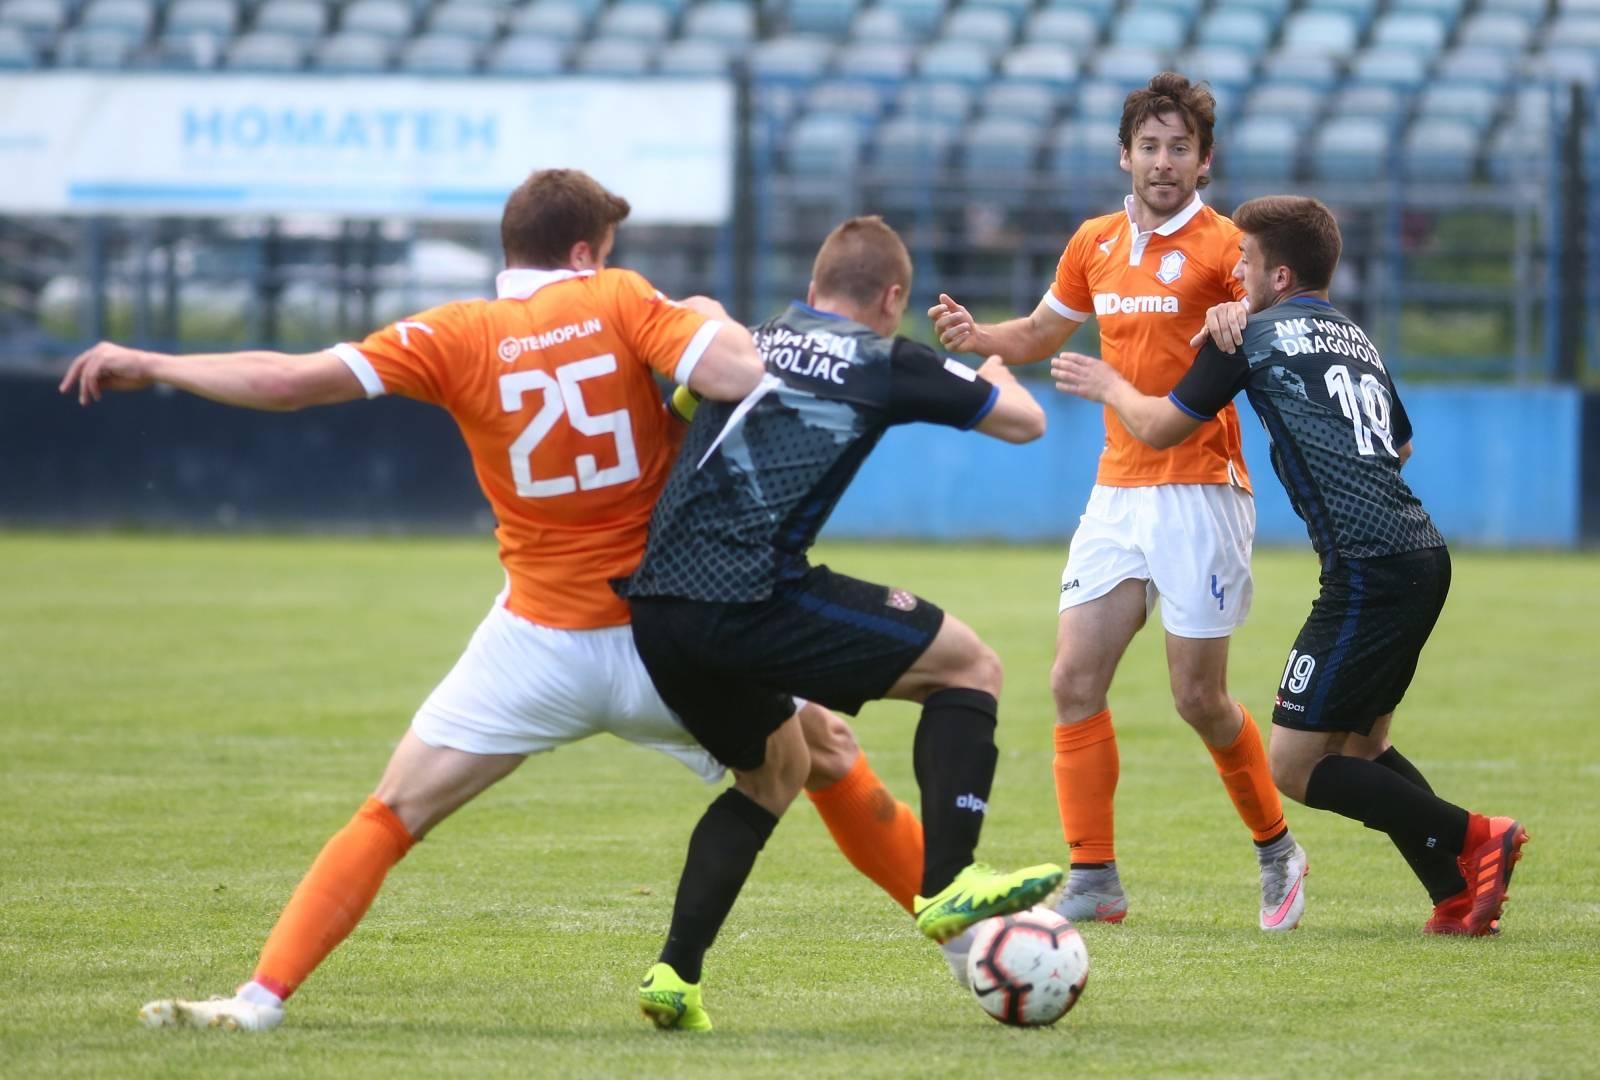 Zagreb: Utakmica 2. HNL, NK Hrvatski dragovoljac i NK Varaždin